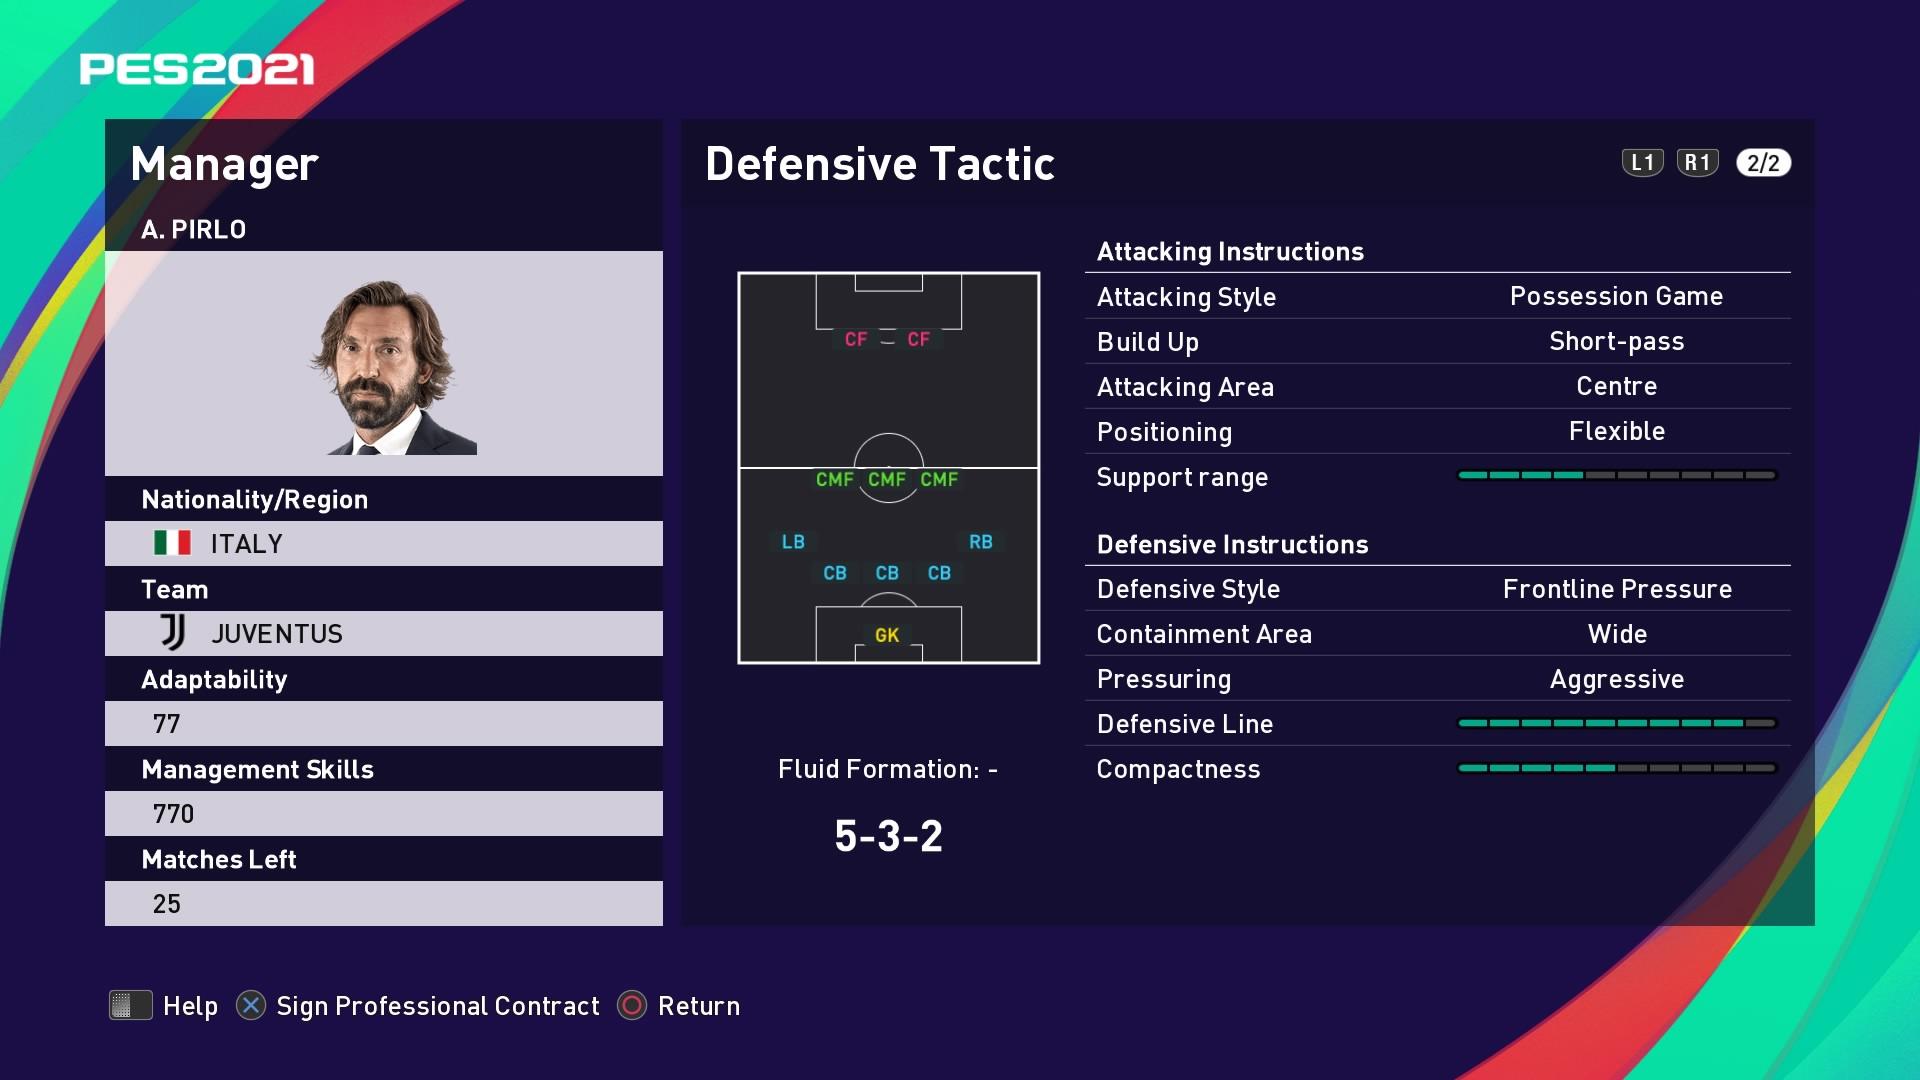 A. Pirlo (2) (Andrea Pirlo) Defensive Tactic in PES 2021 myClub